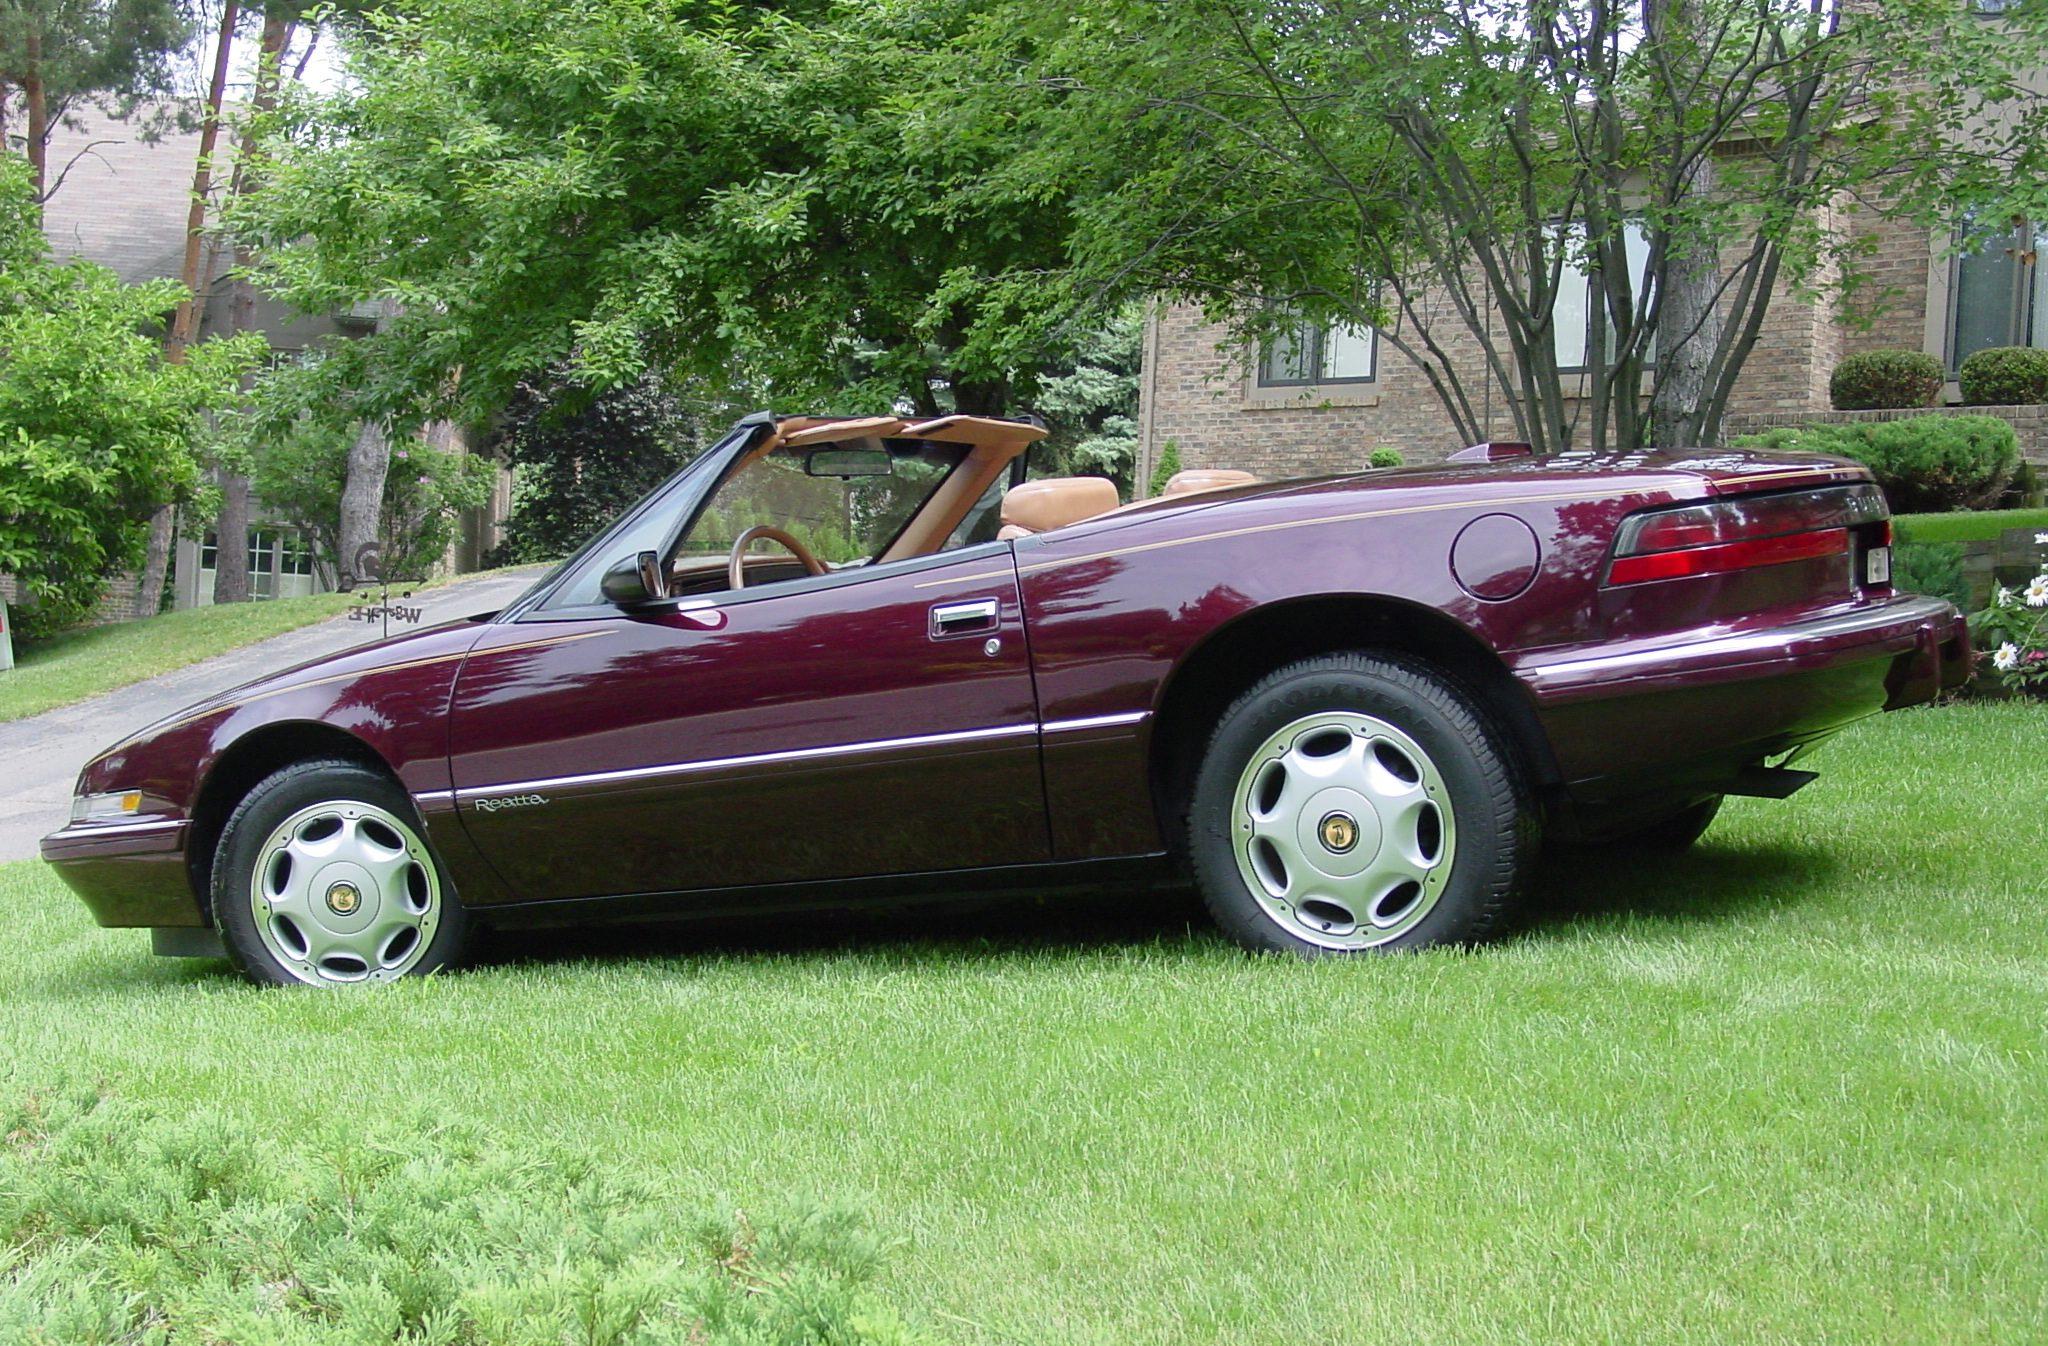 Reatta Convertible Coupe Rear Three-Quarter In Grass